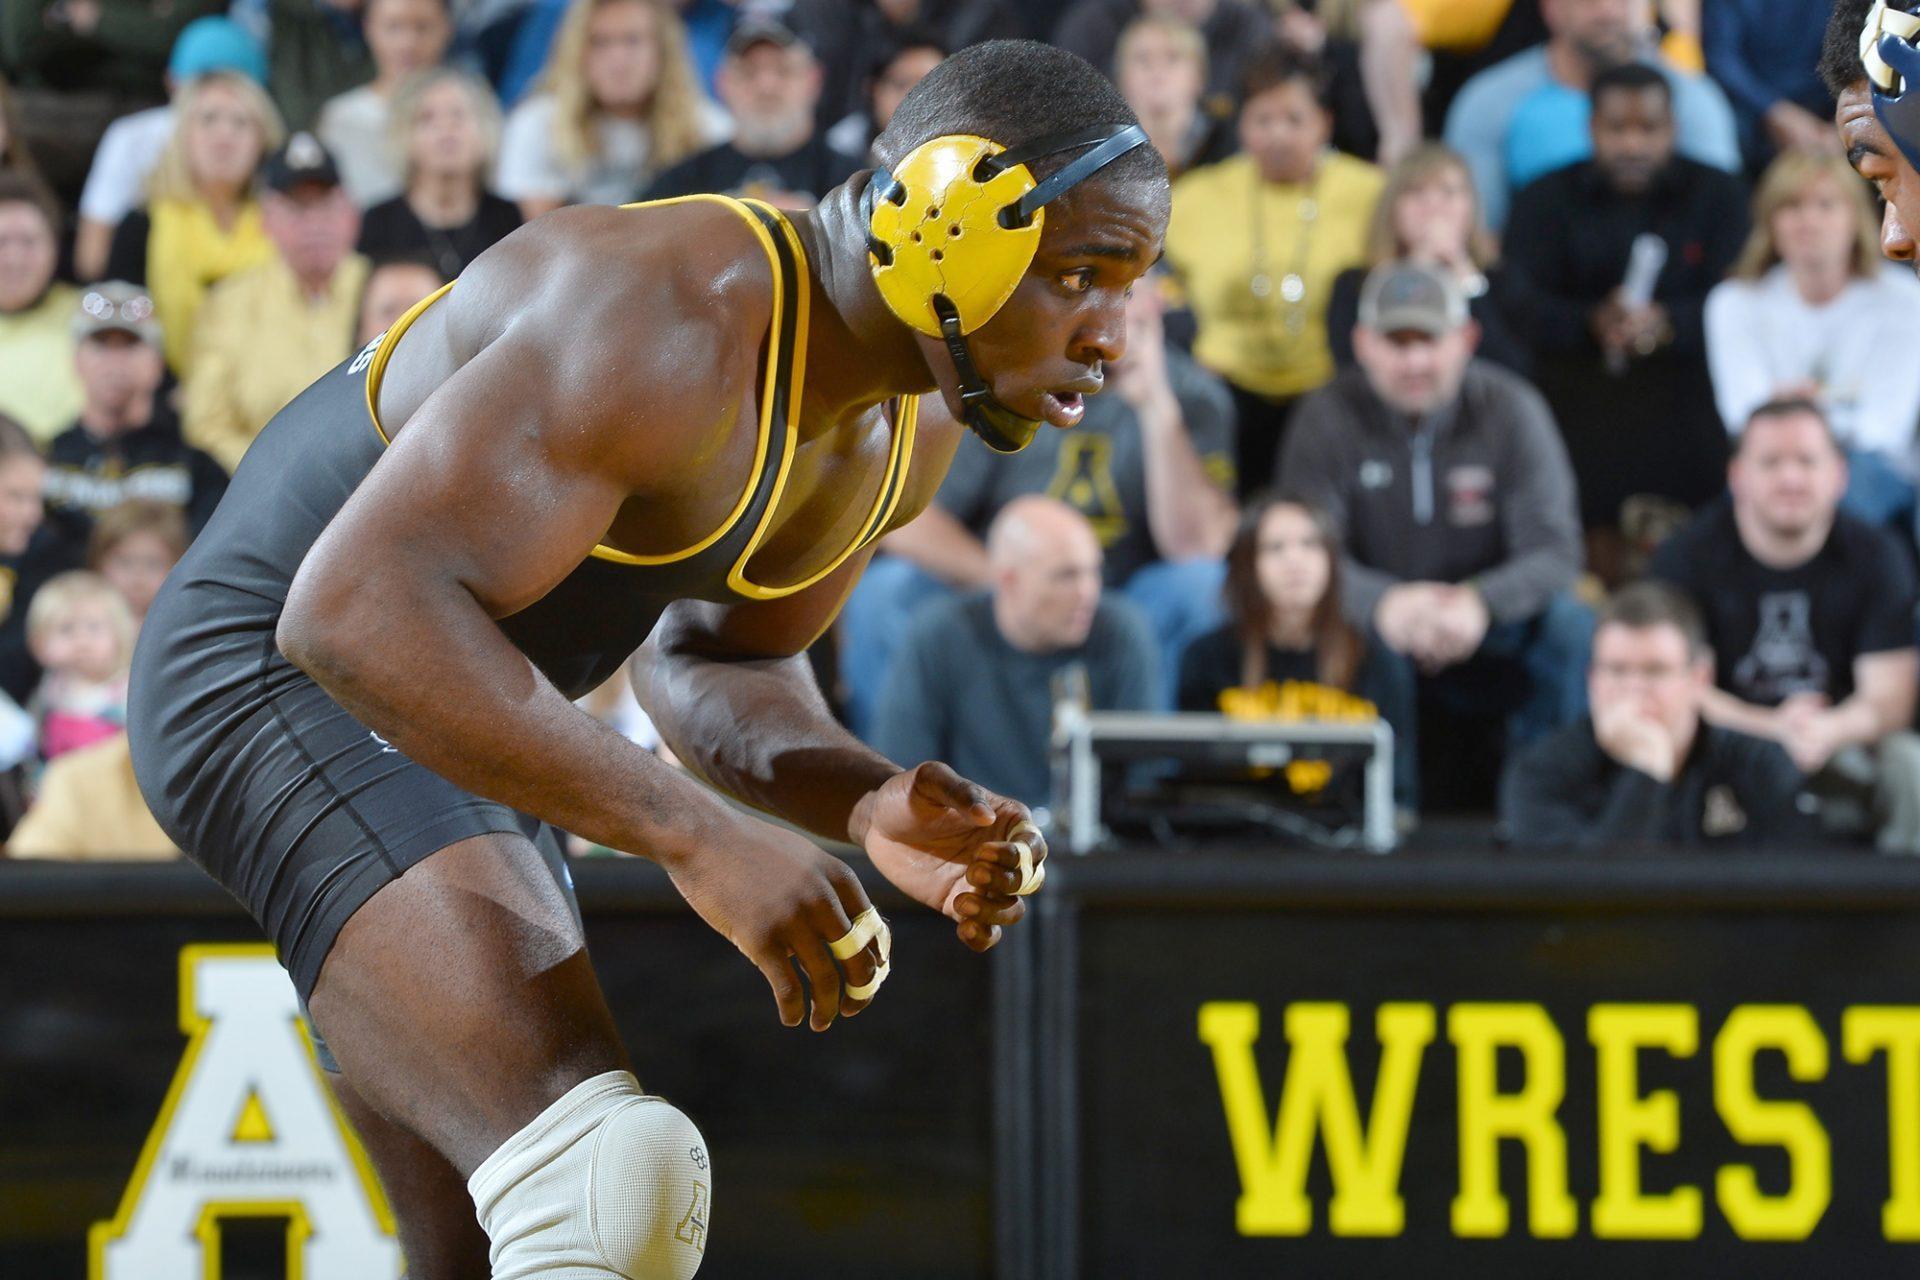 Wrestling program looks to follow up last year's success